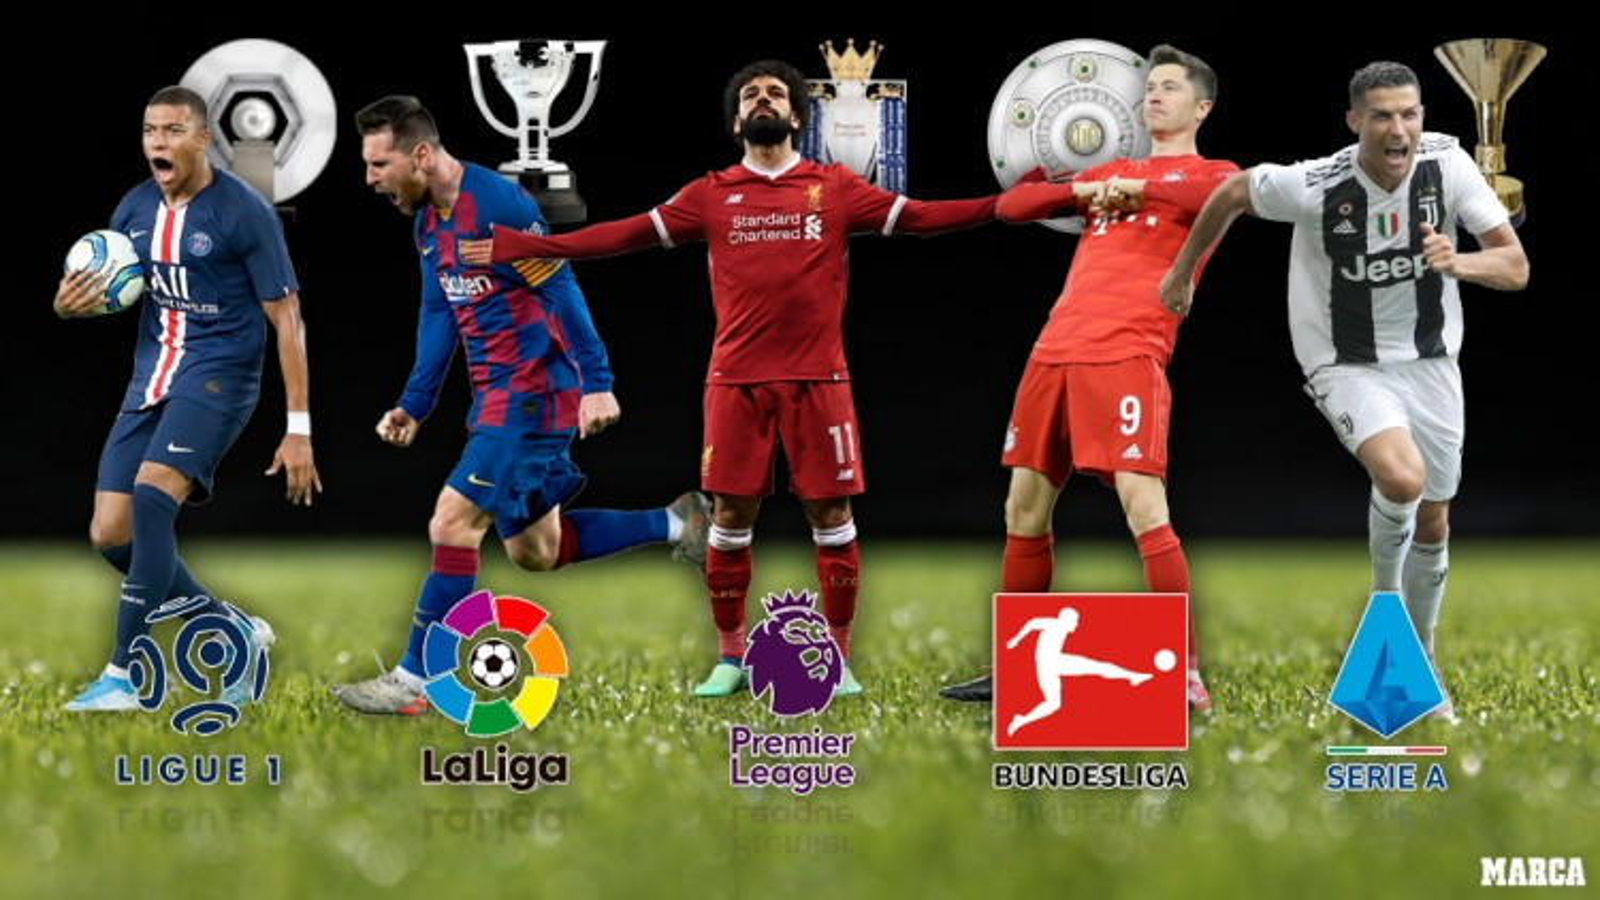 Điều gì sẽ xảy ra nếu Premier League, La Liga học theo Ligue 1?